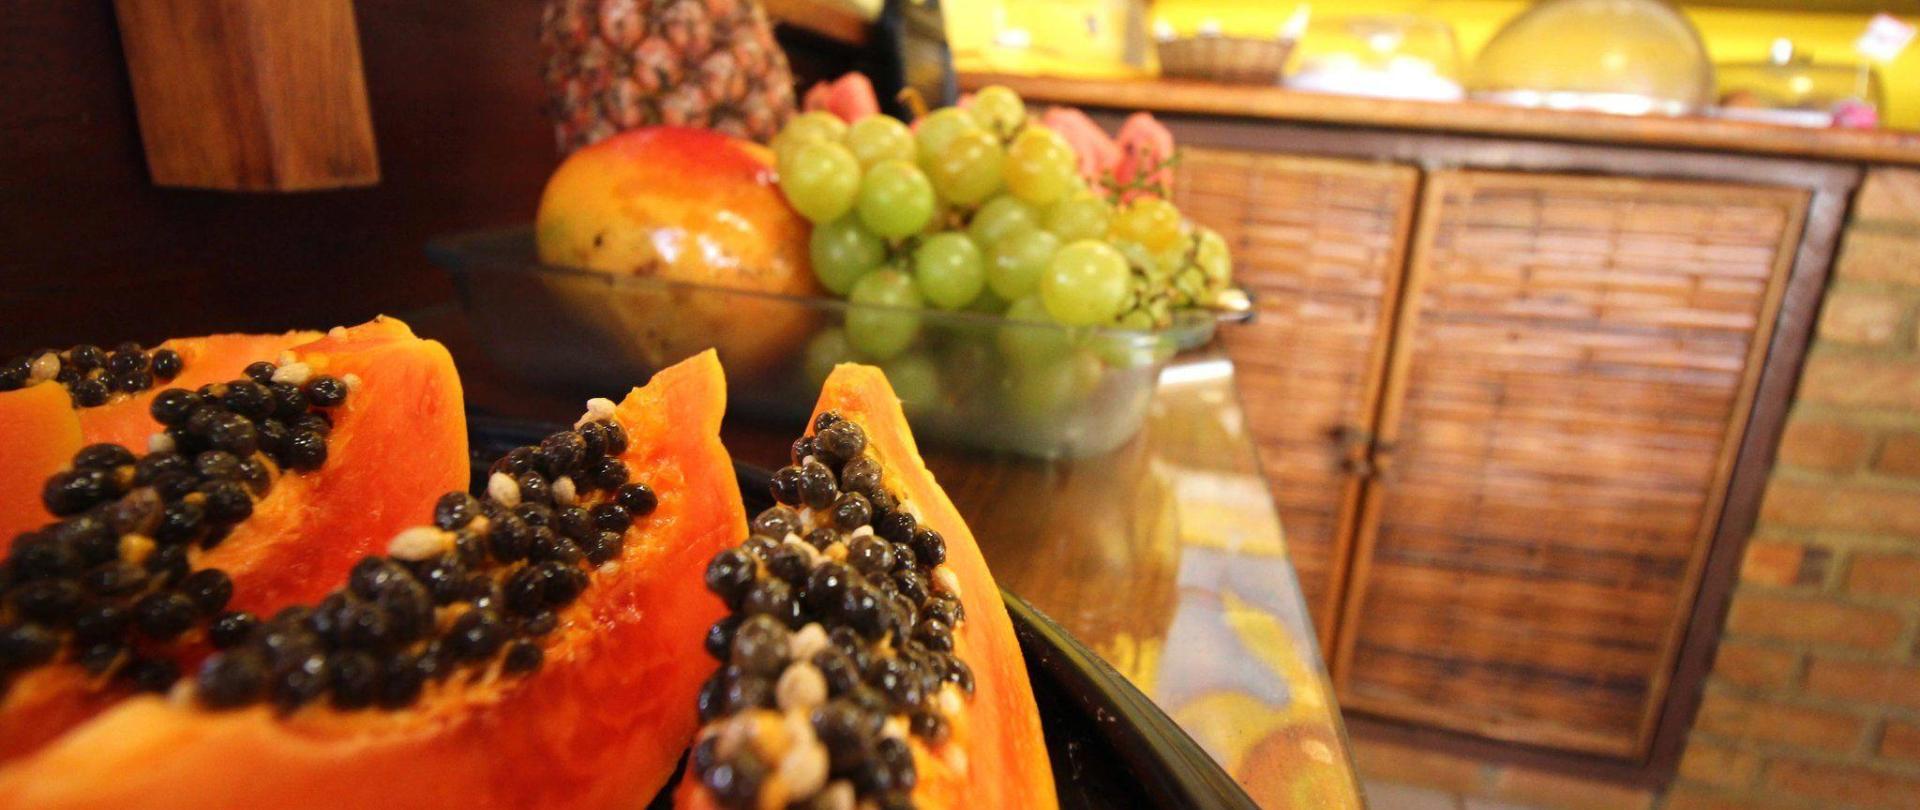 bf2-fruits.jpg